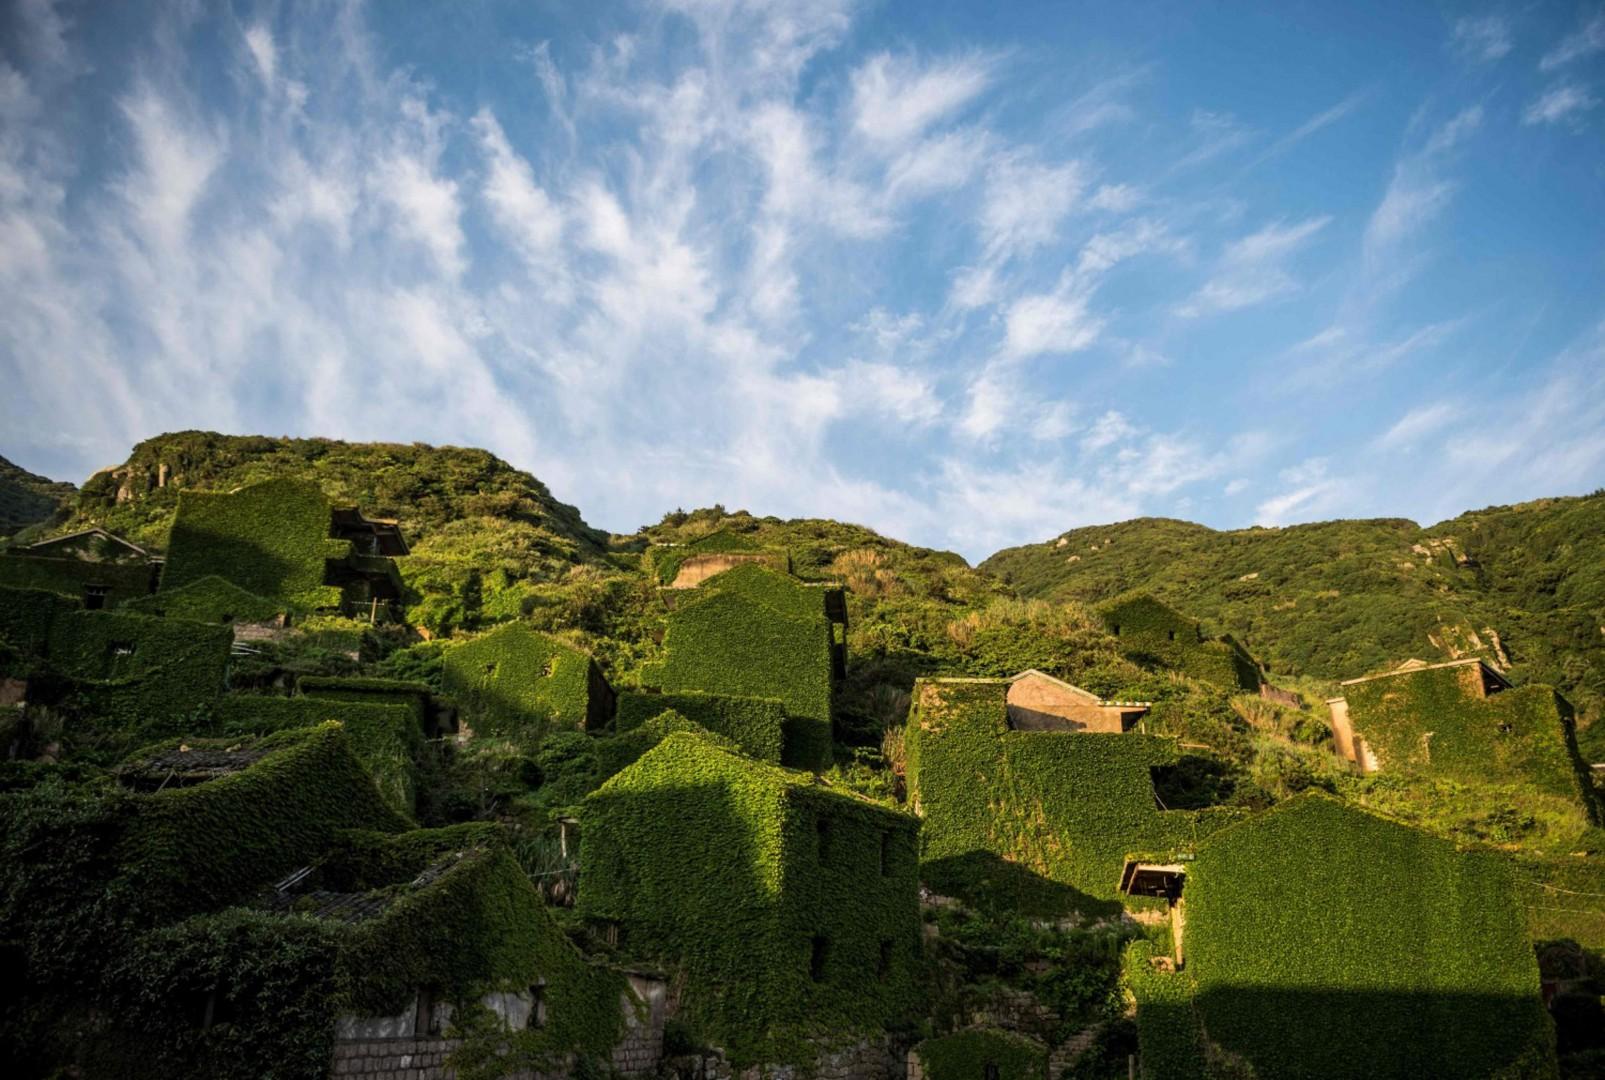 Villaggi divorati edera (LaPresse)